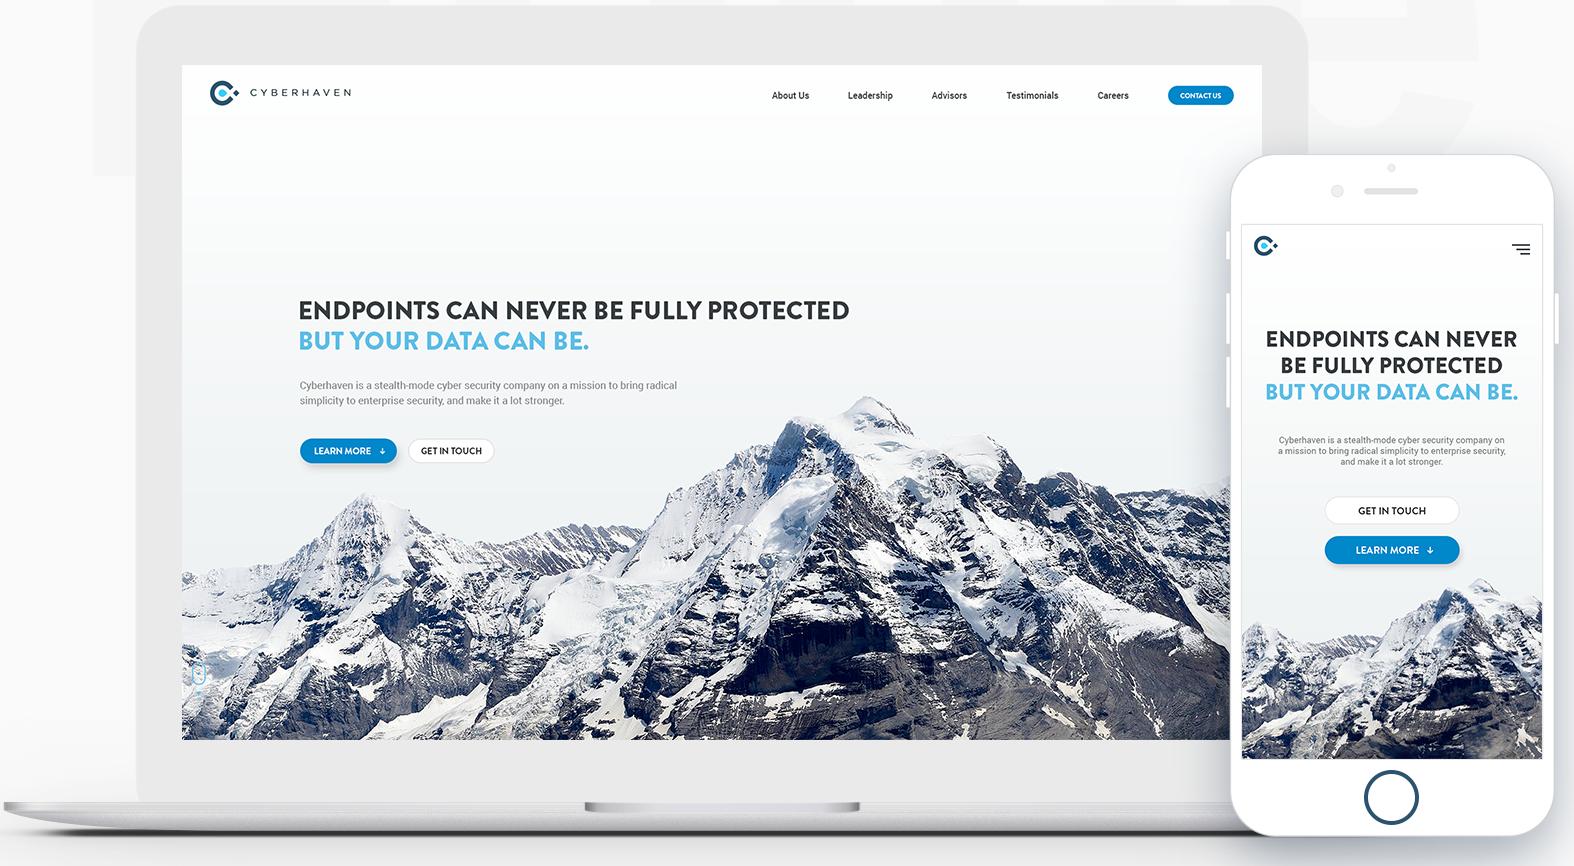 Cyberhaven website landing page